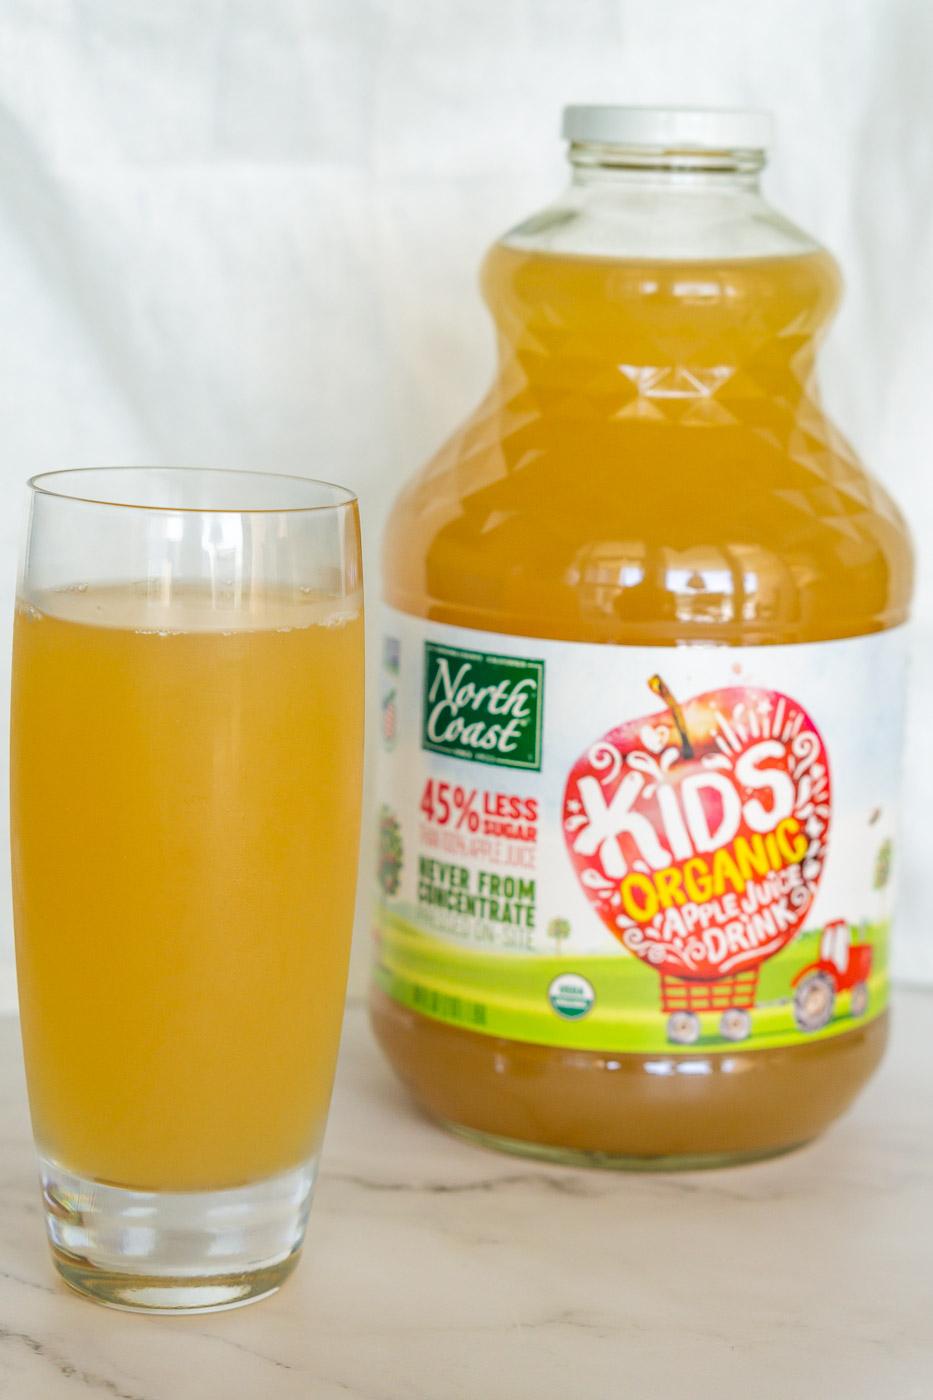 north coast organic apple juice drink bottle and glass